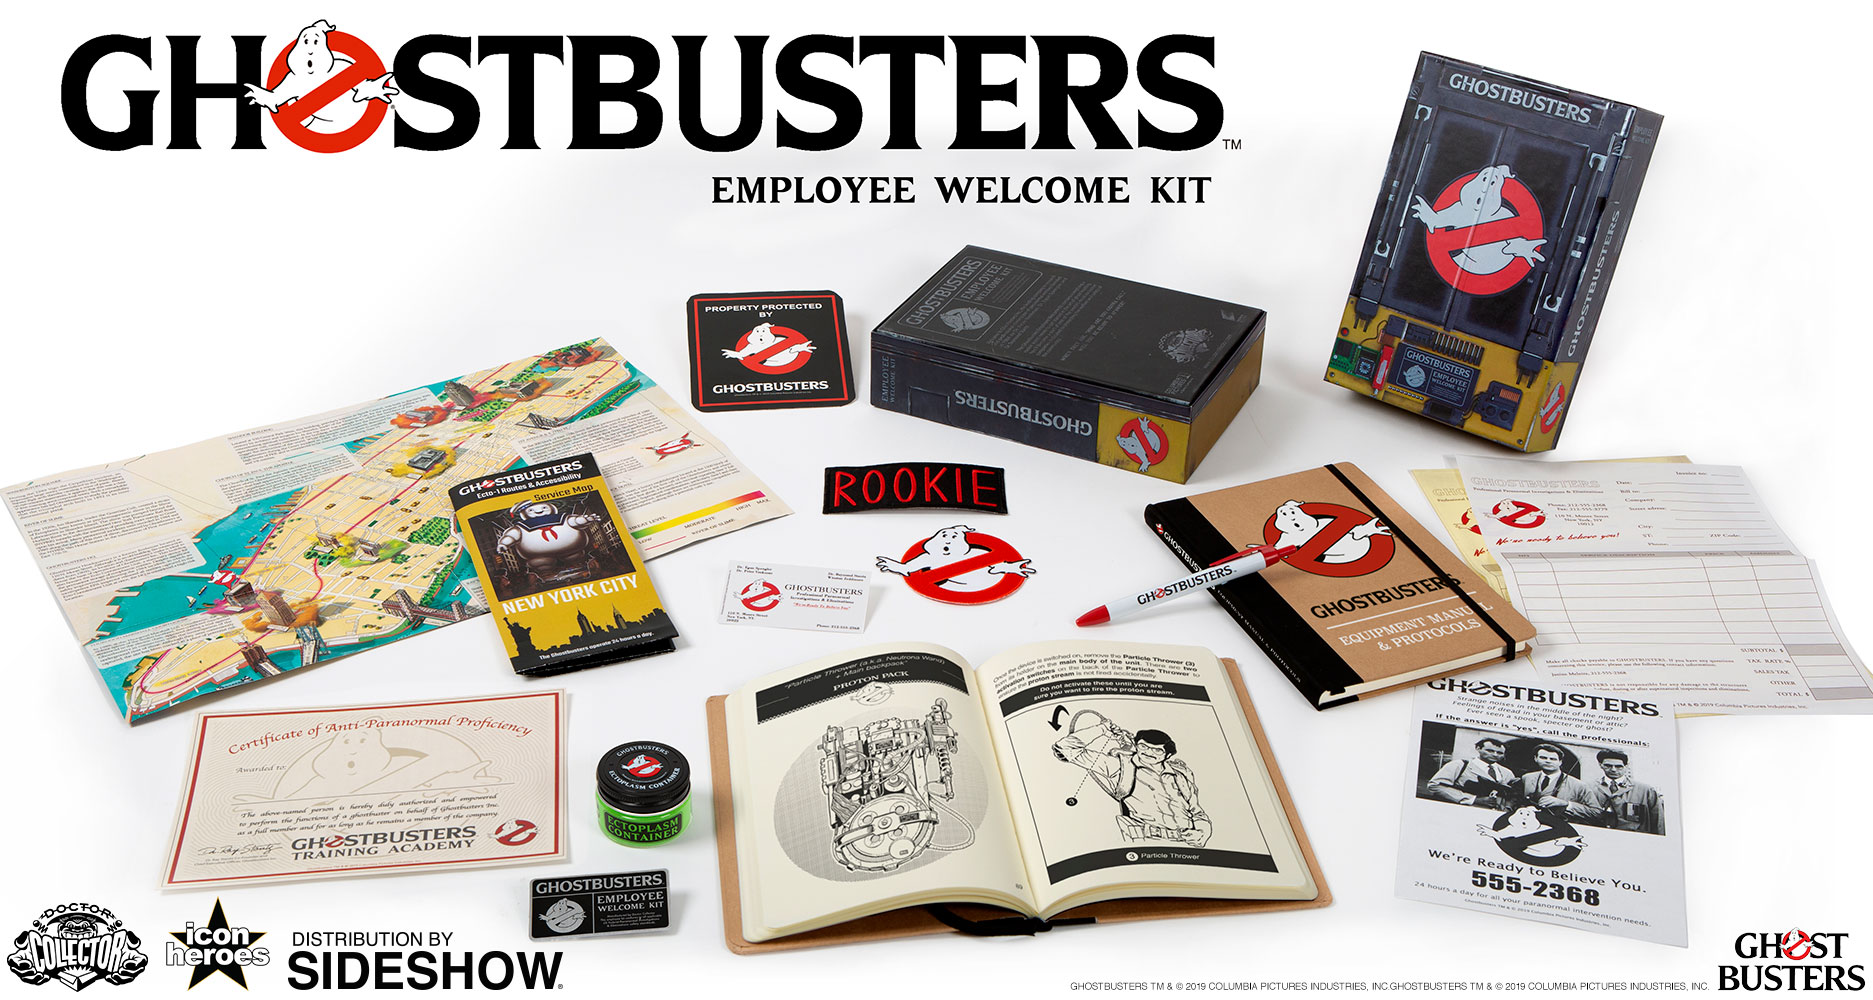 [Bild: ghostbusters-employee-welcome-kit_ghostb...d77485.jpg]